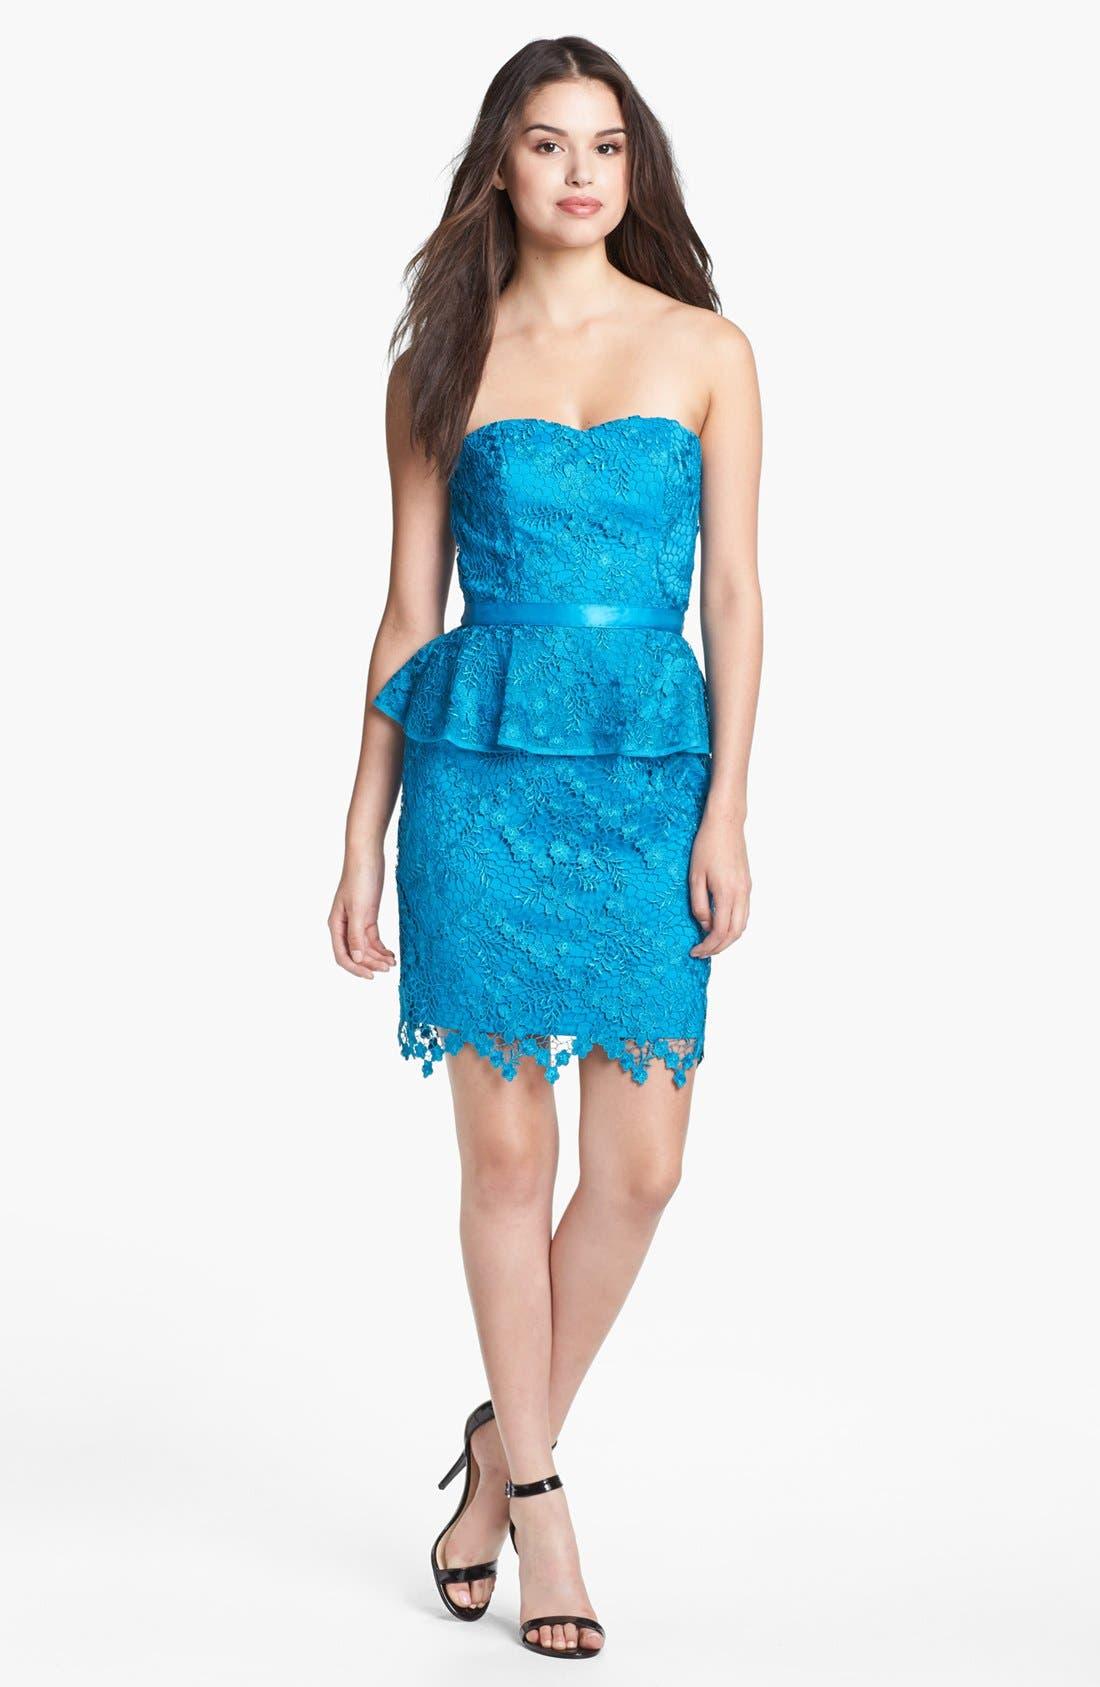 Alternate Image 1 Selected - Aidan Mattox Lace Peplum Dress (Online Only)